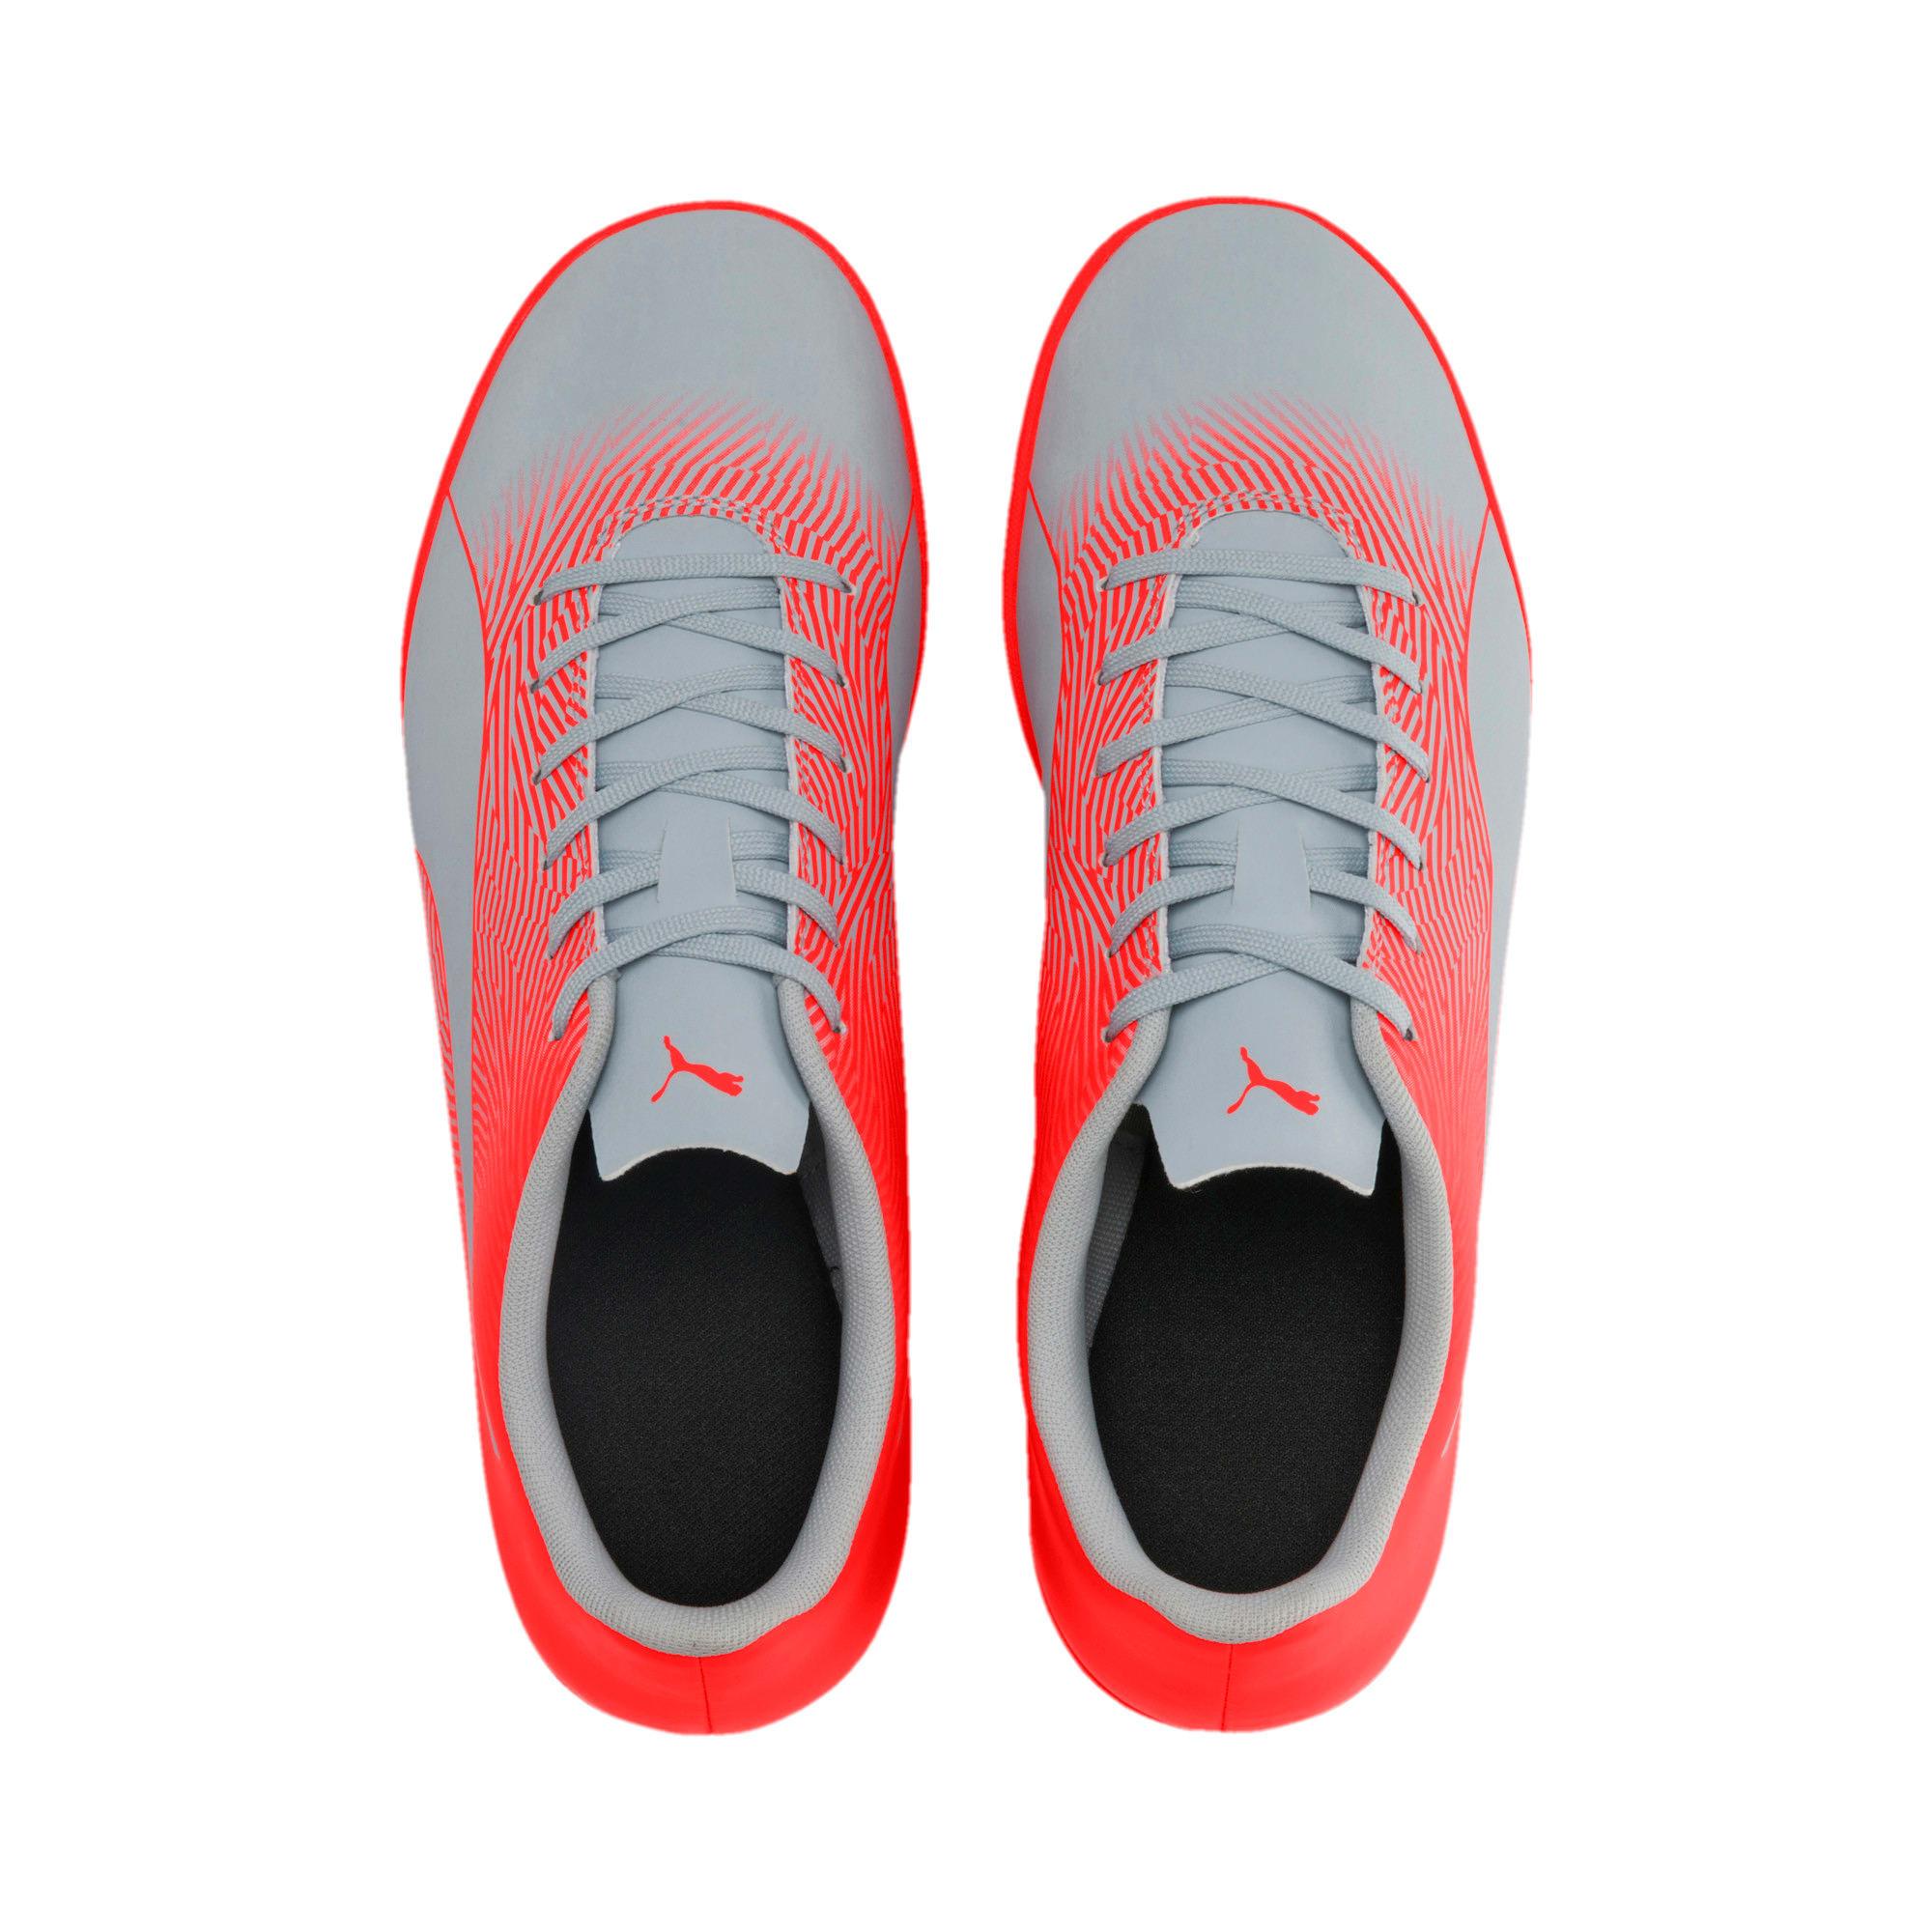 Thumbnail 7 of PUMA Spirit II IT Men's Soccer Shoes, Glacial Blue-Nrgy Red, medium